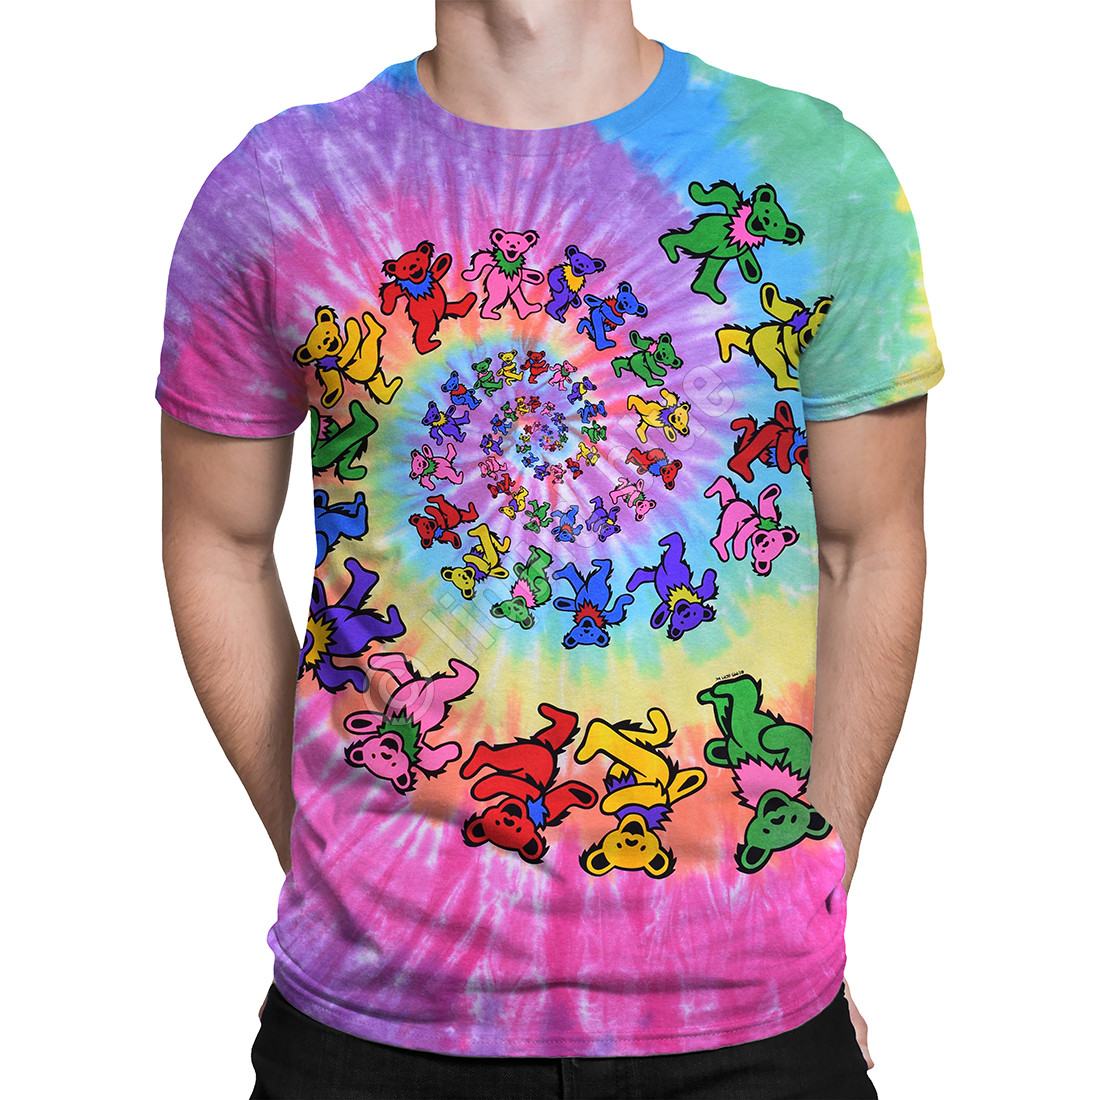 Spiral Bears Tie-Dye T-Shirt